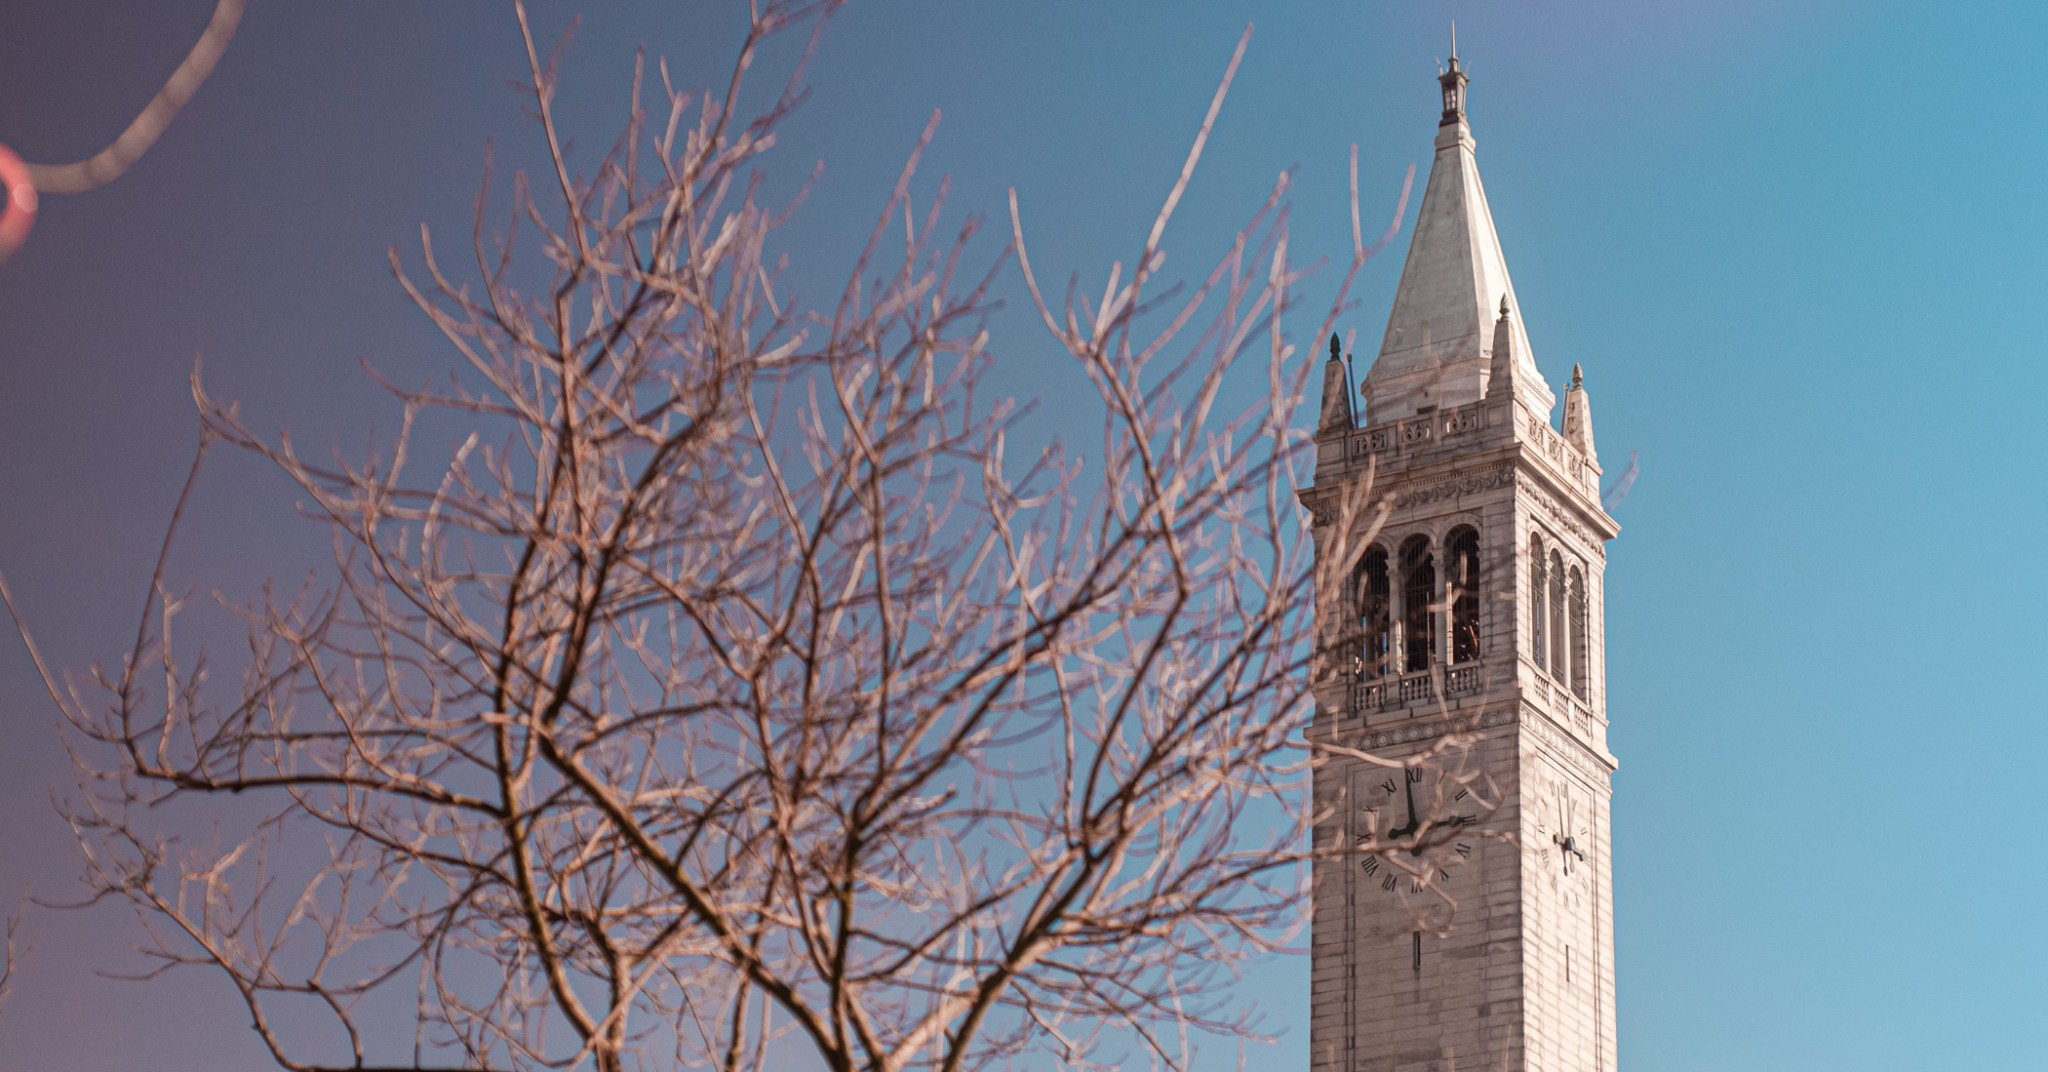 sather tower, campanile, UC Berkeley